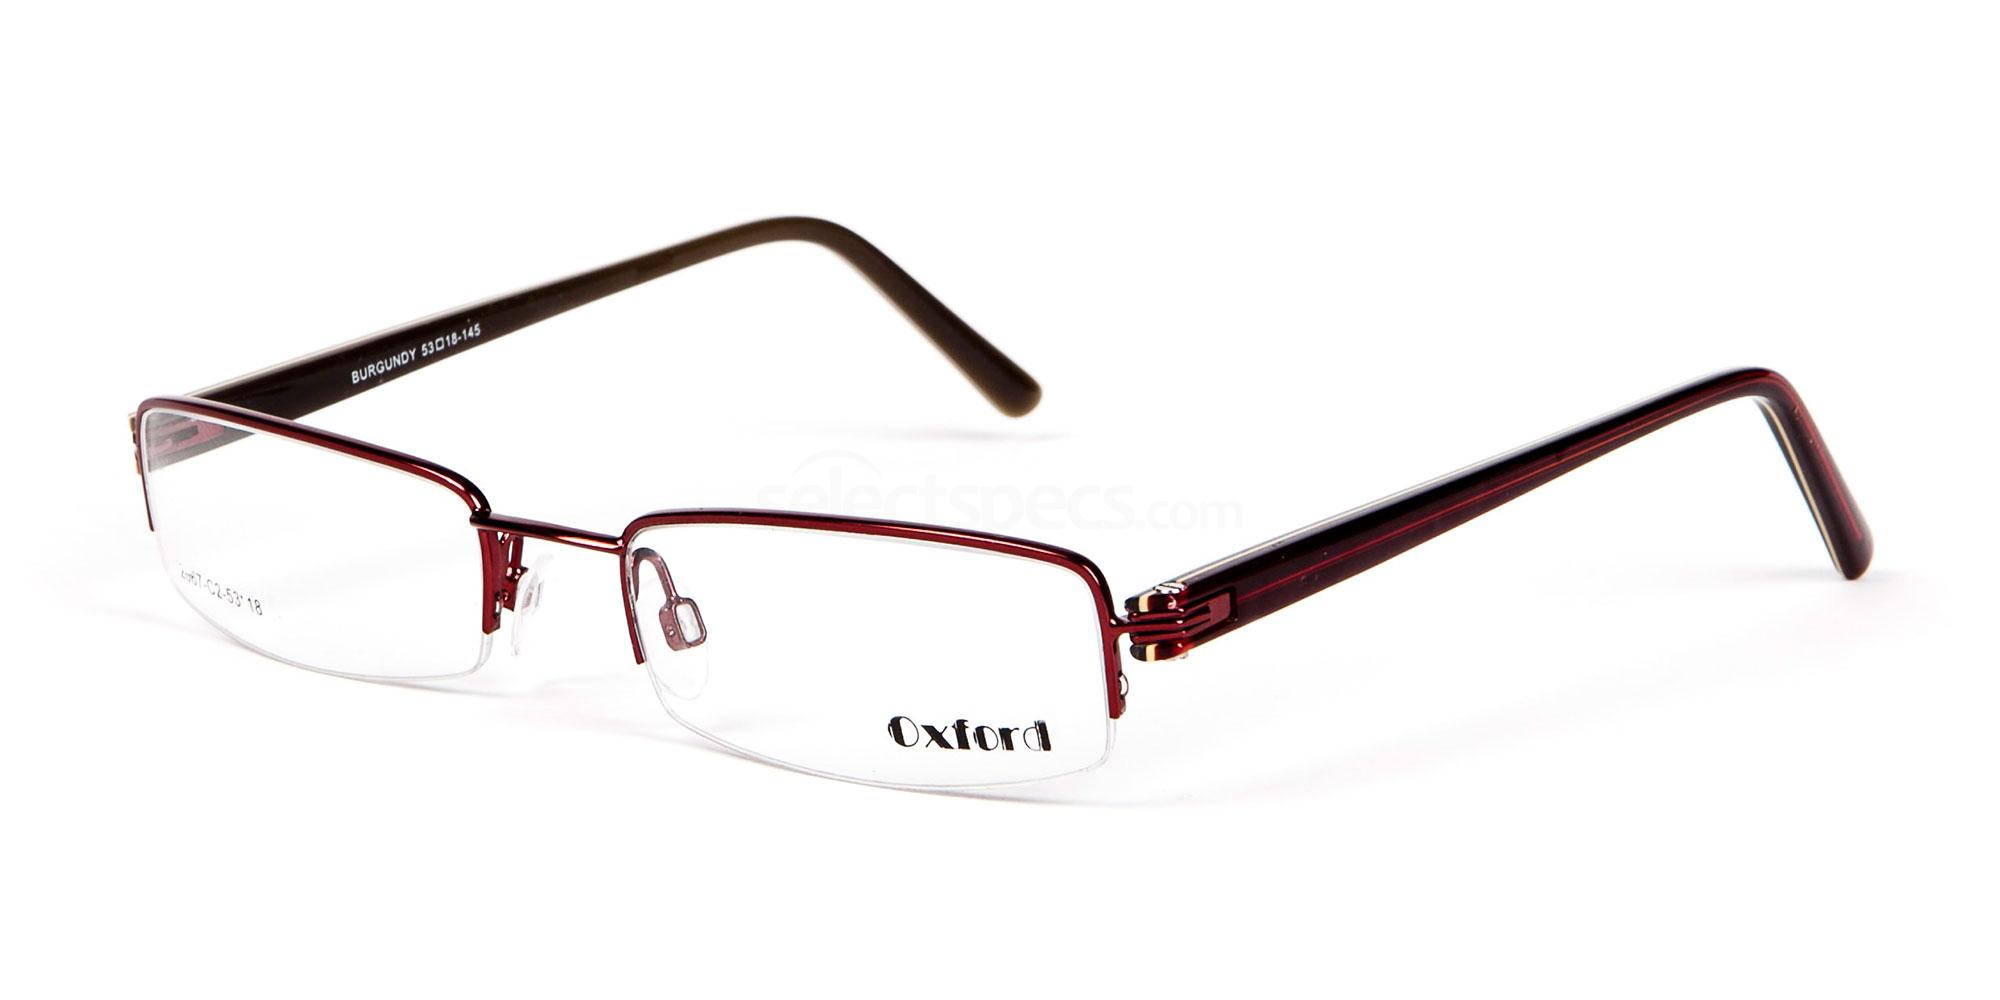 C2 OXF 2067 Glasses, Oxford